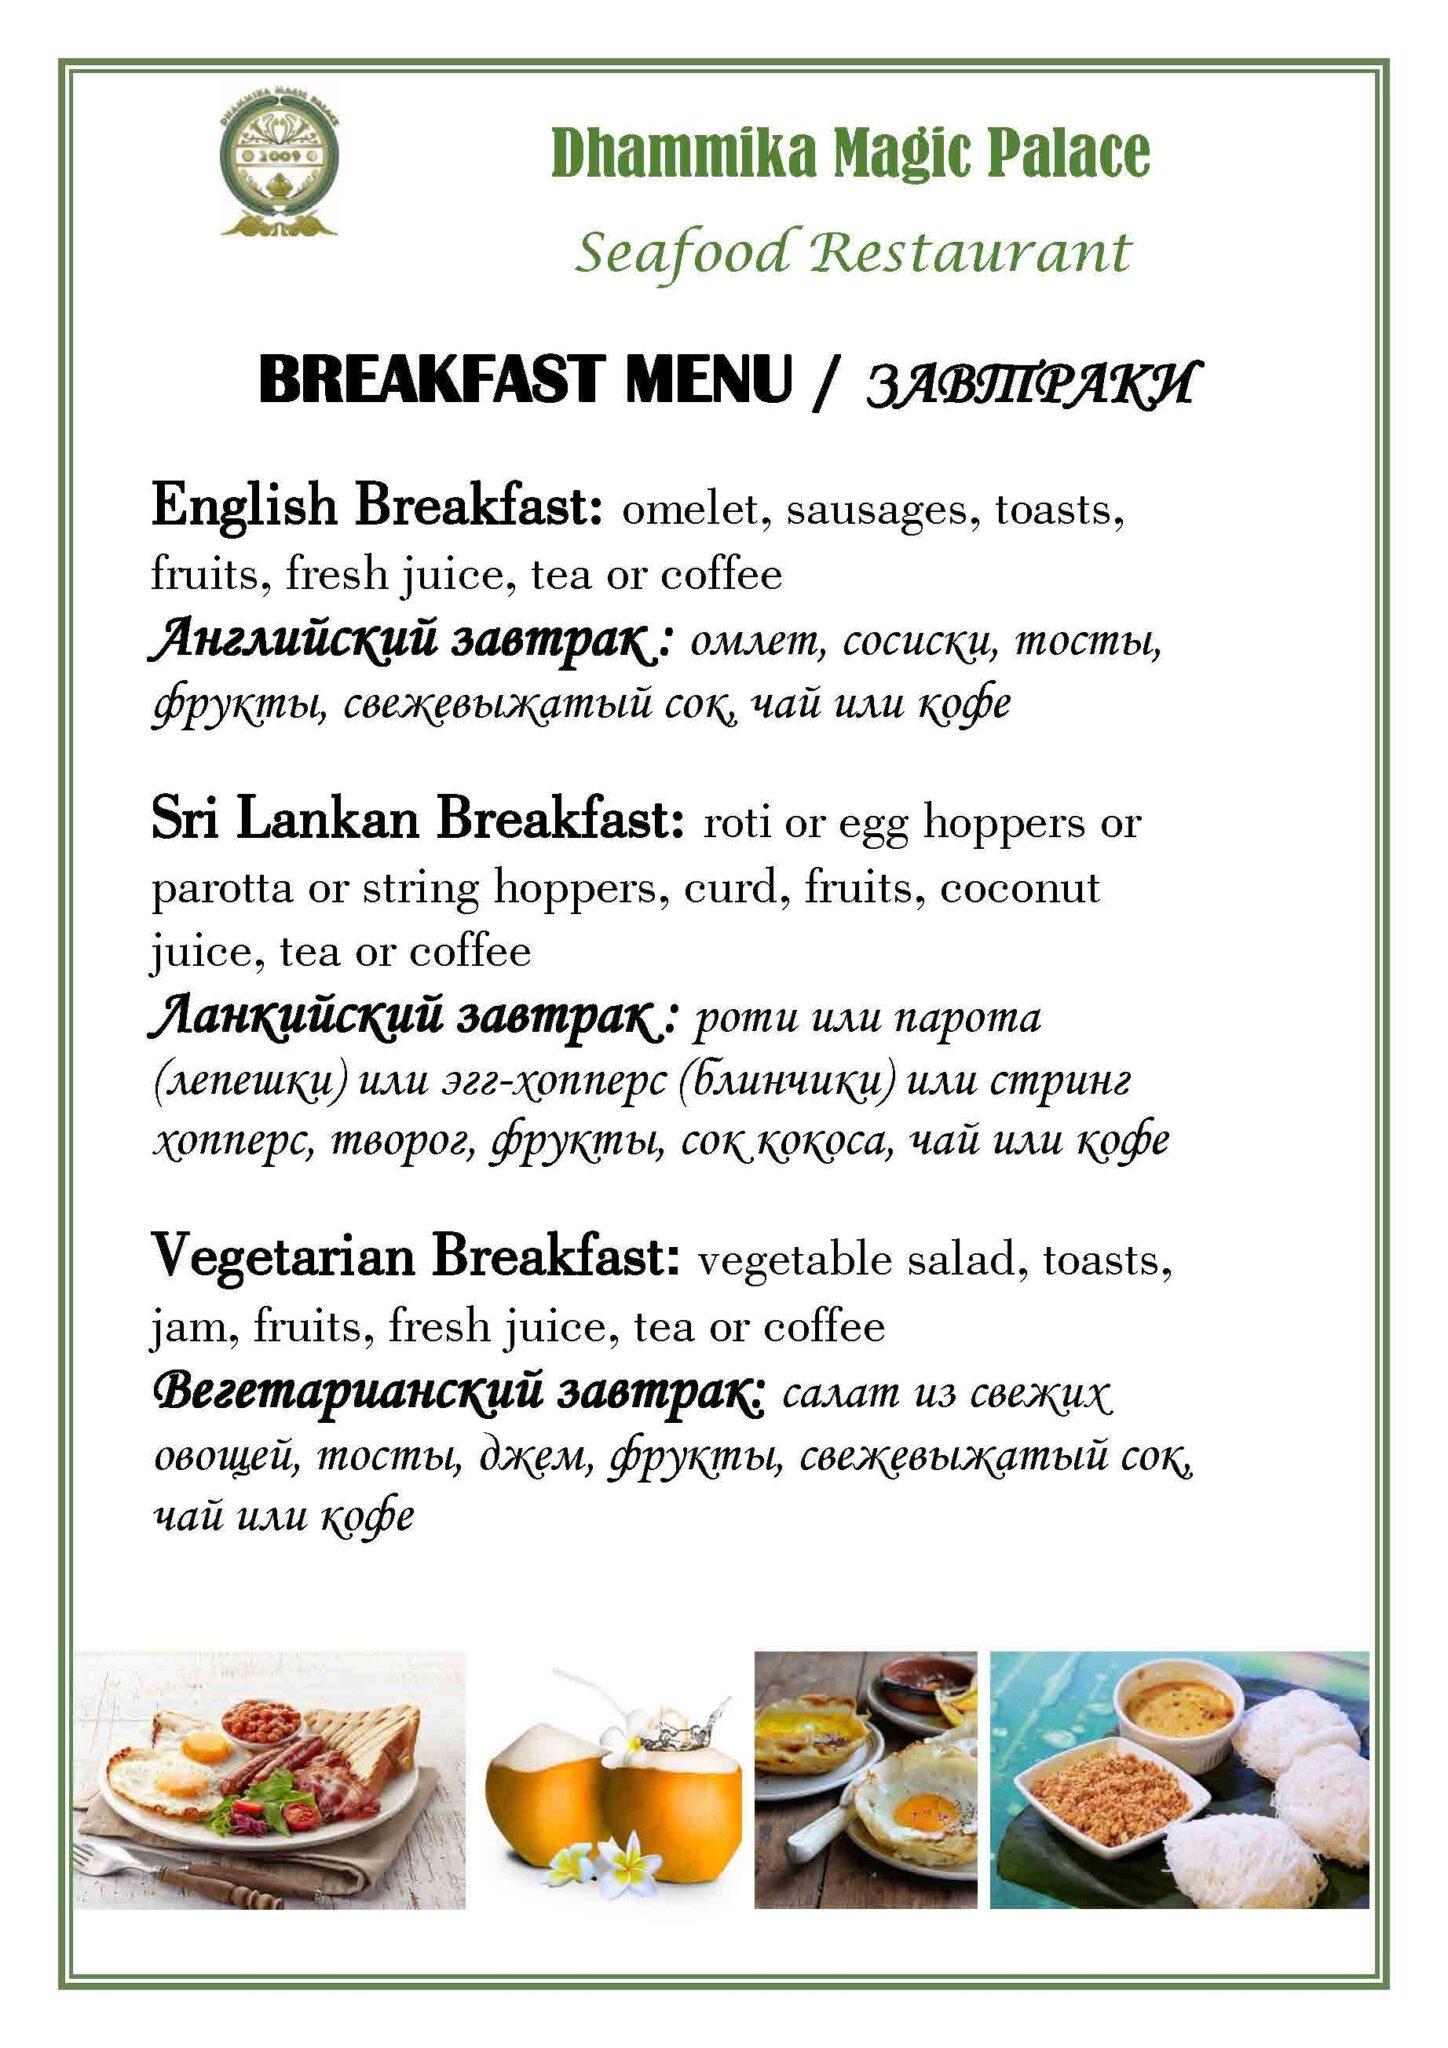 MENU2_16_Breakfast